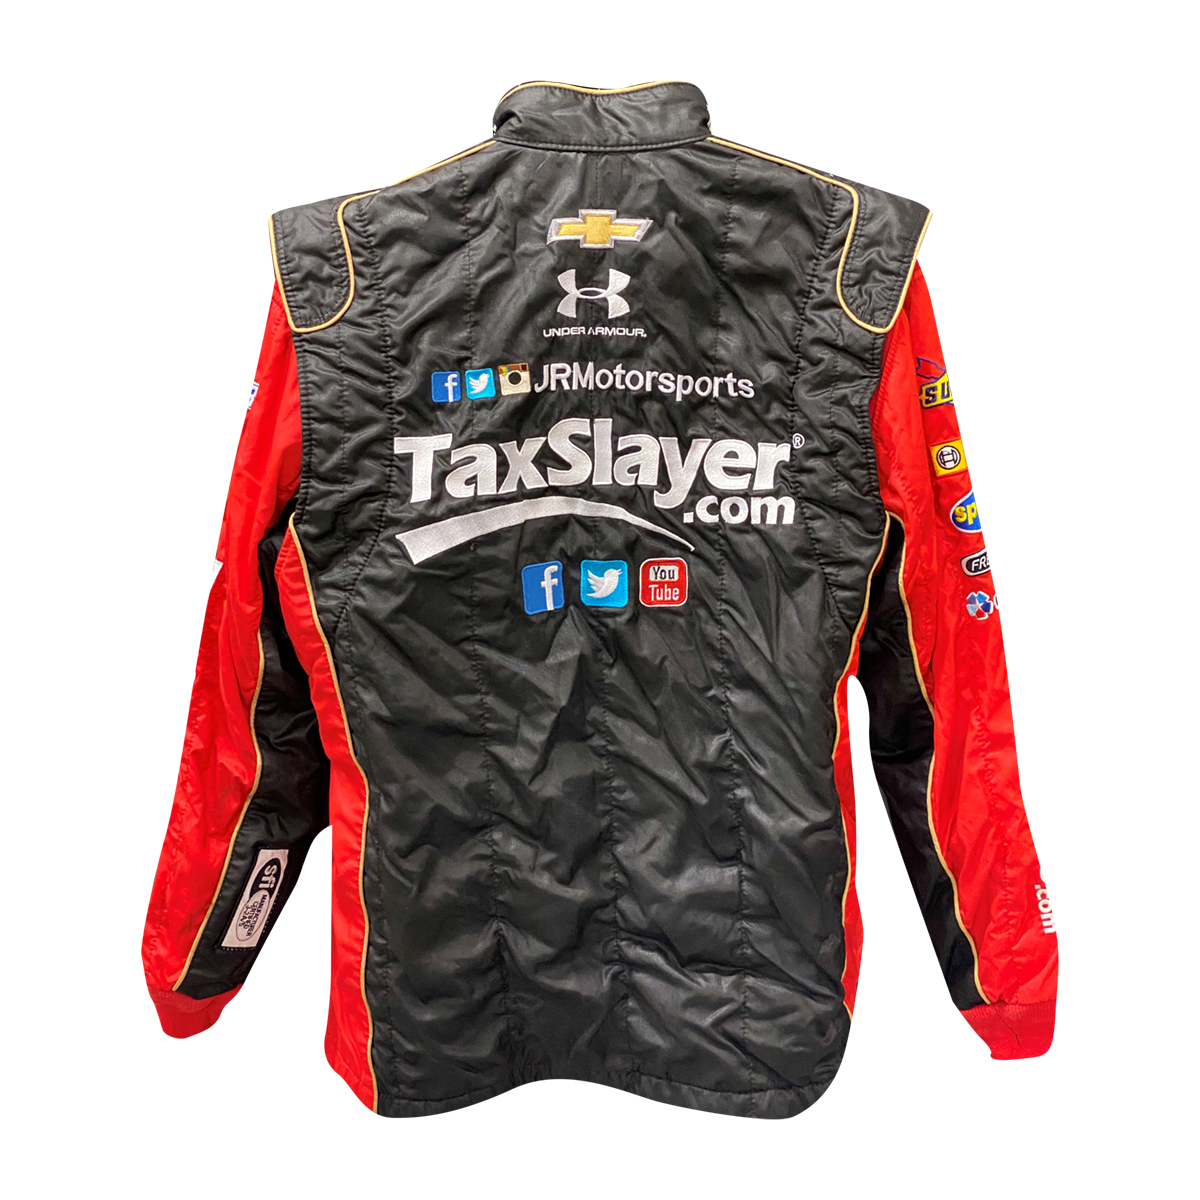 JRM Crew Jacket 2017 RACE USED - Taxslayer.com